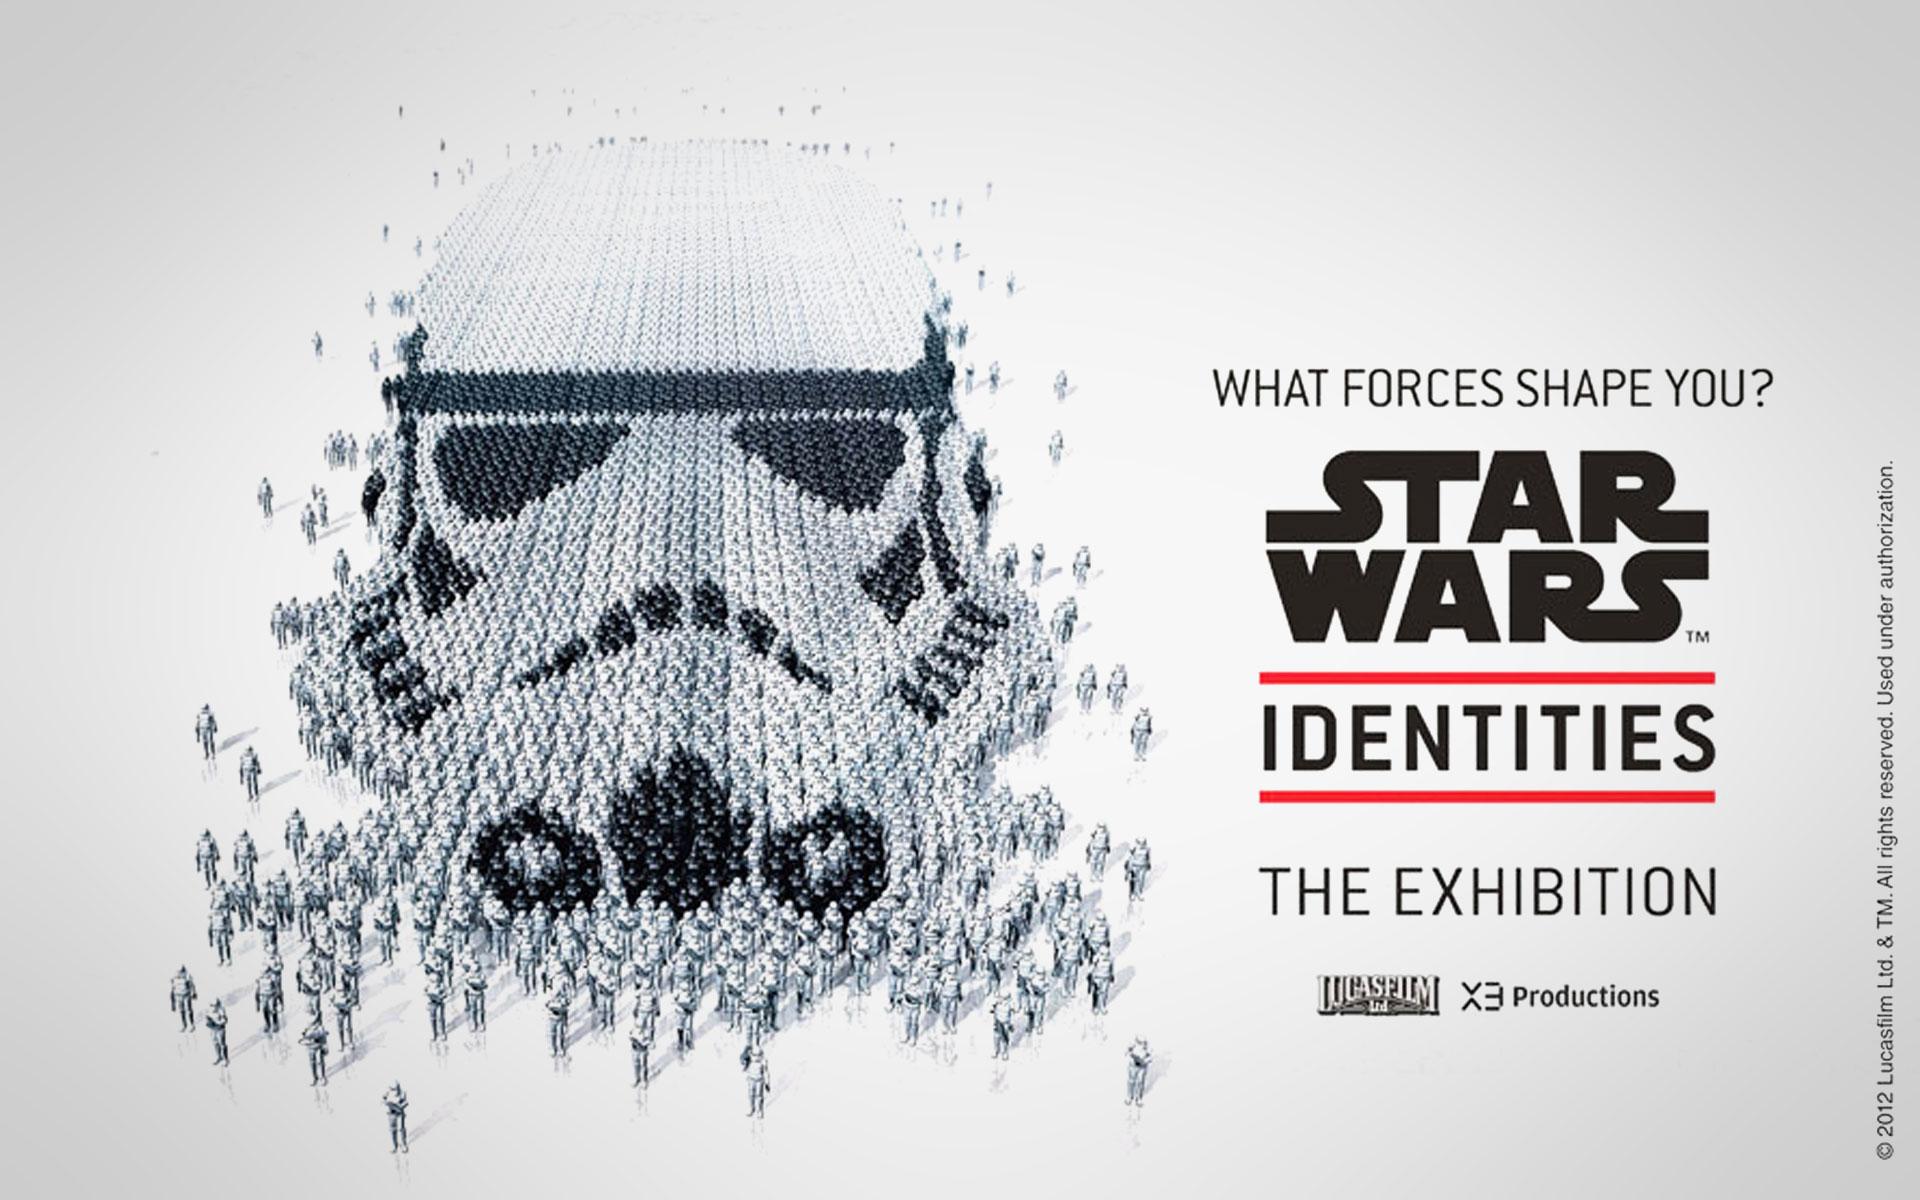 Wallpaper Star Wars Identities